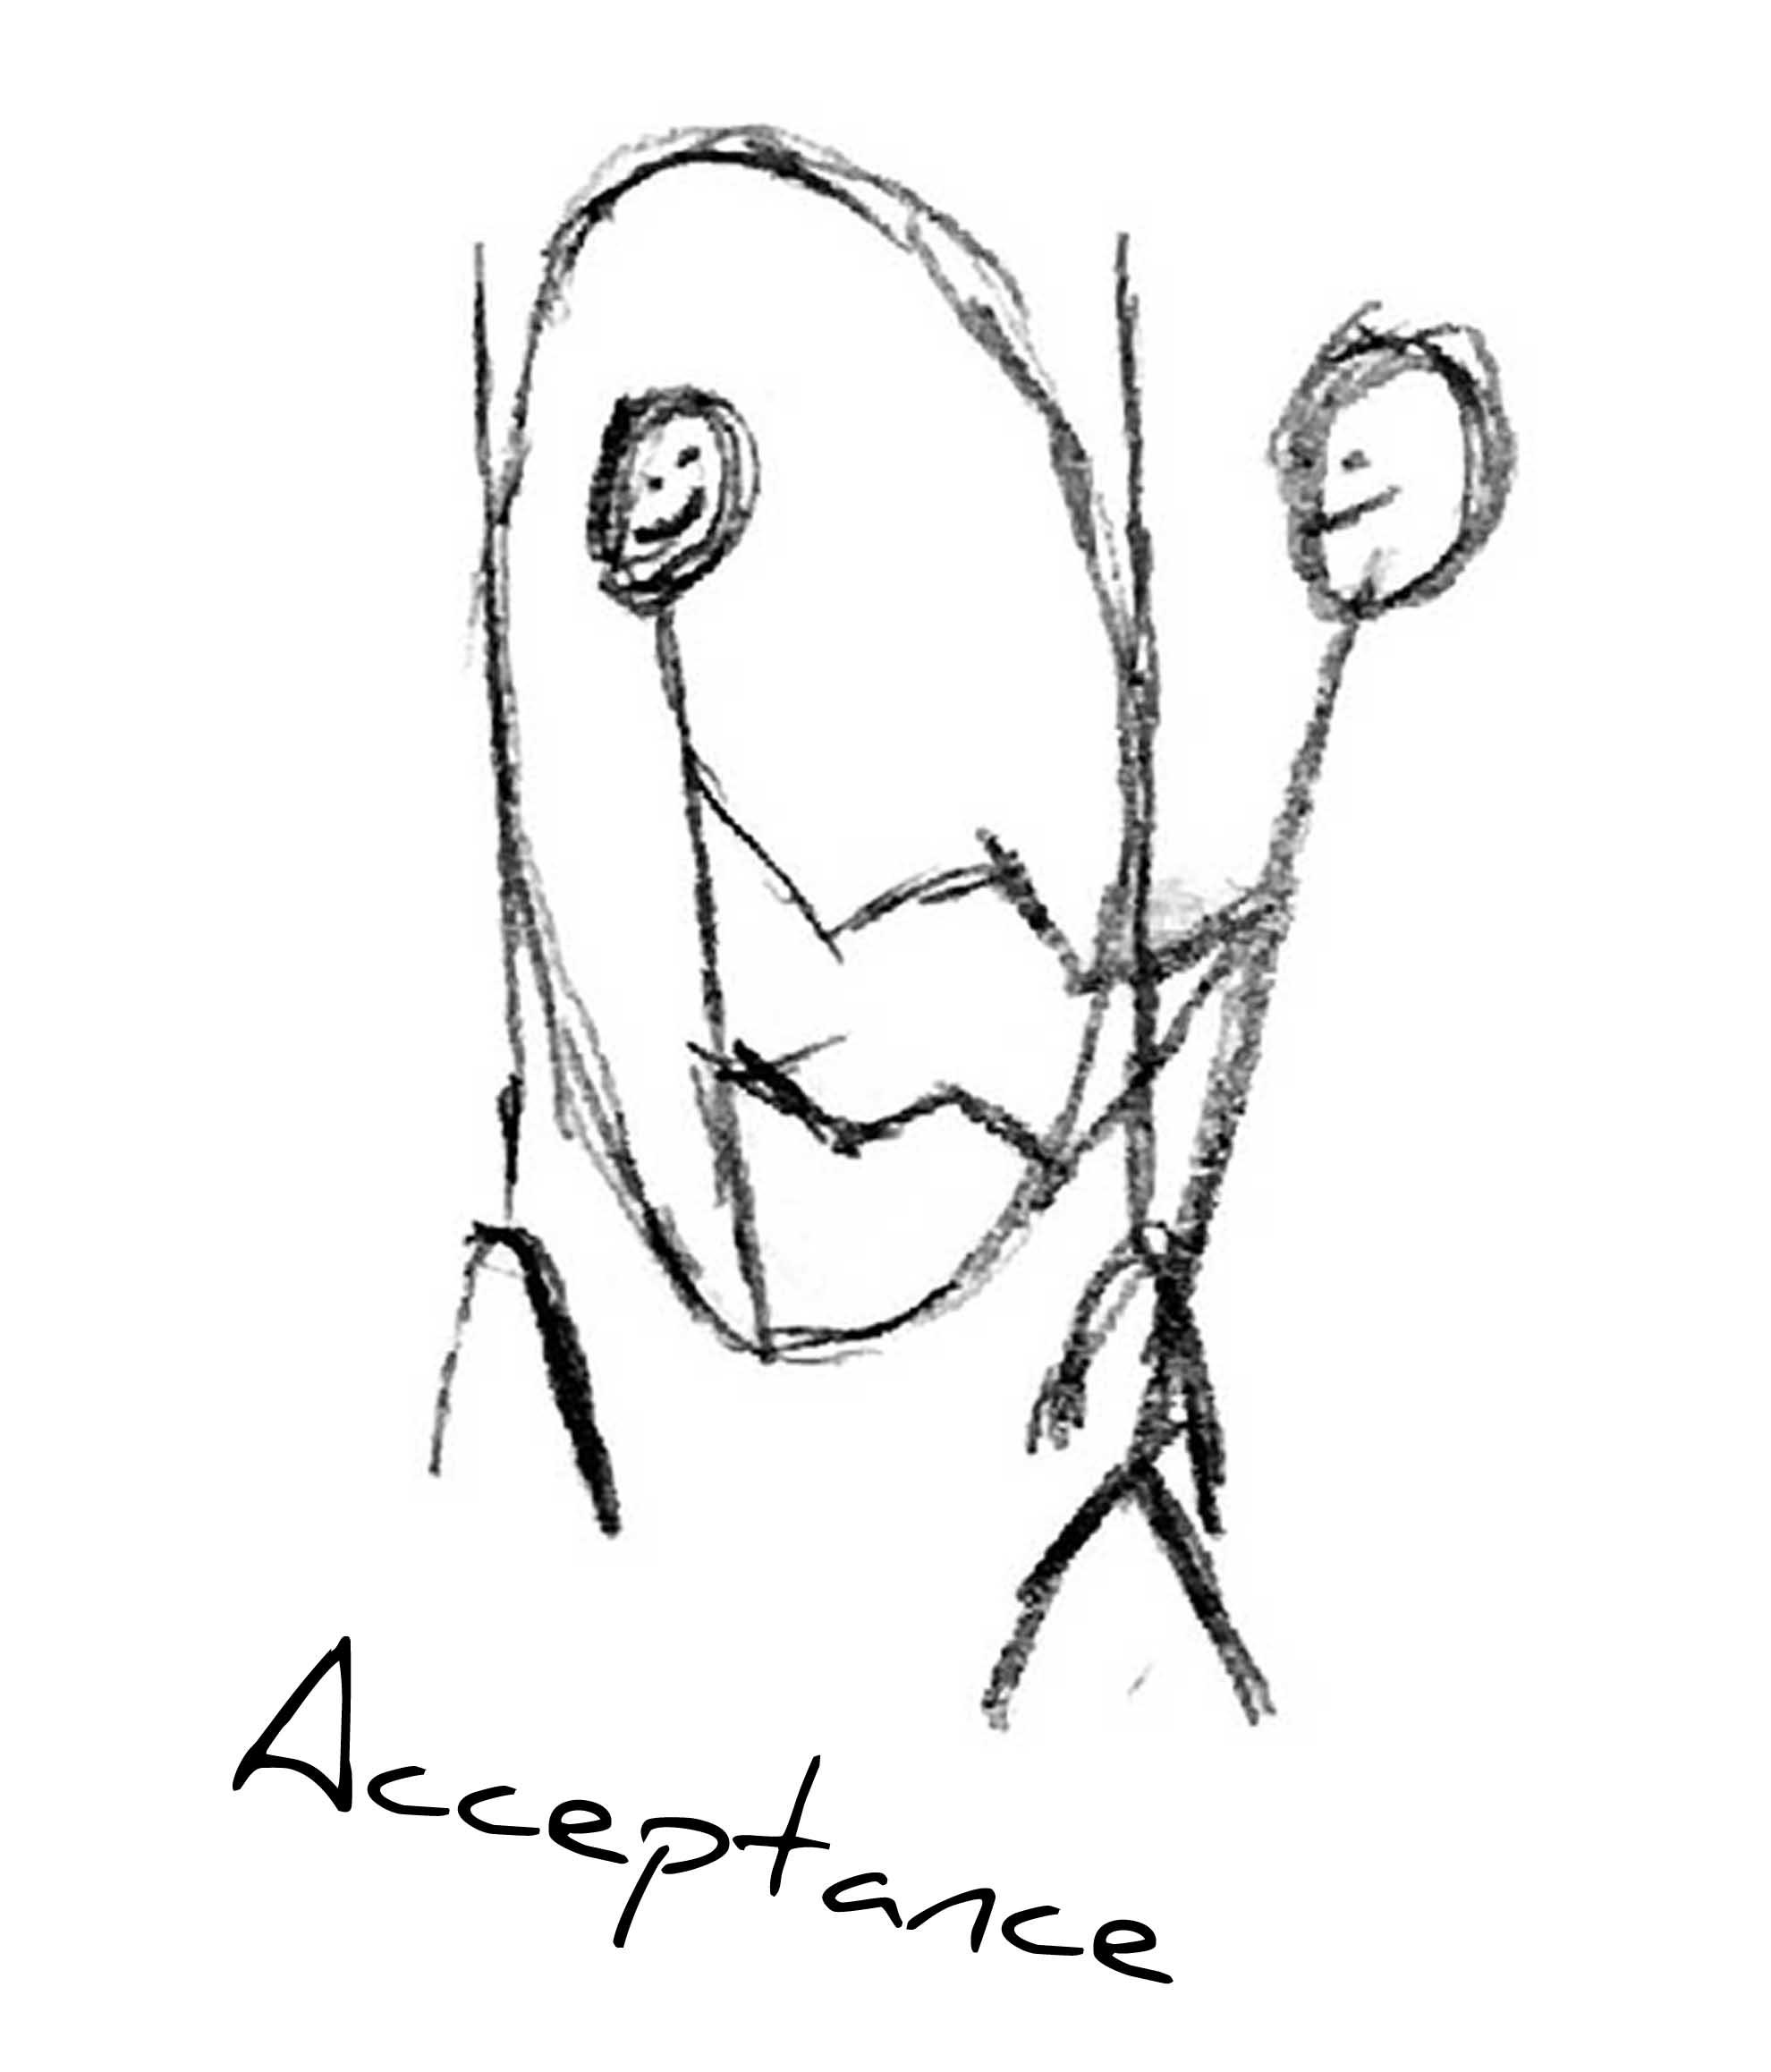 4 acceptance w text.jpg